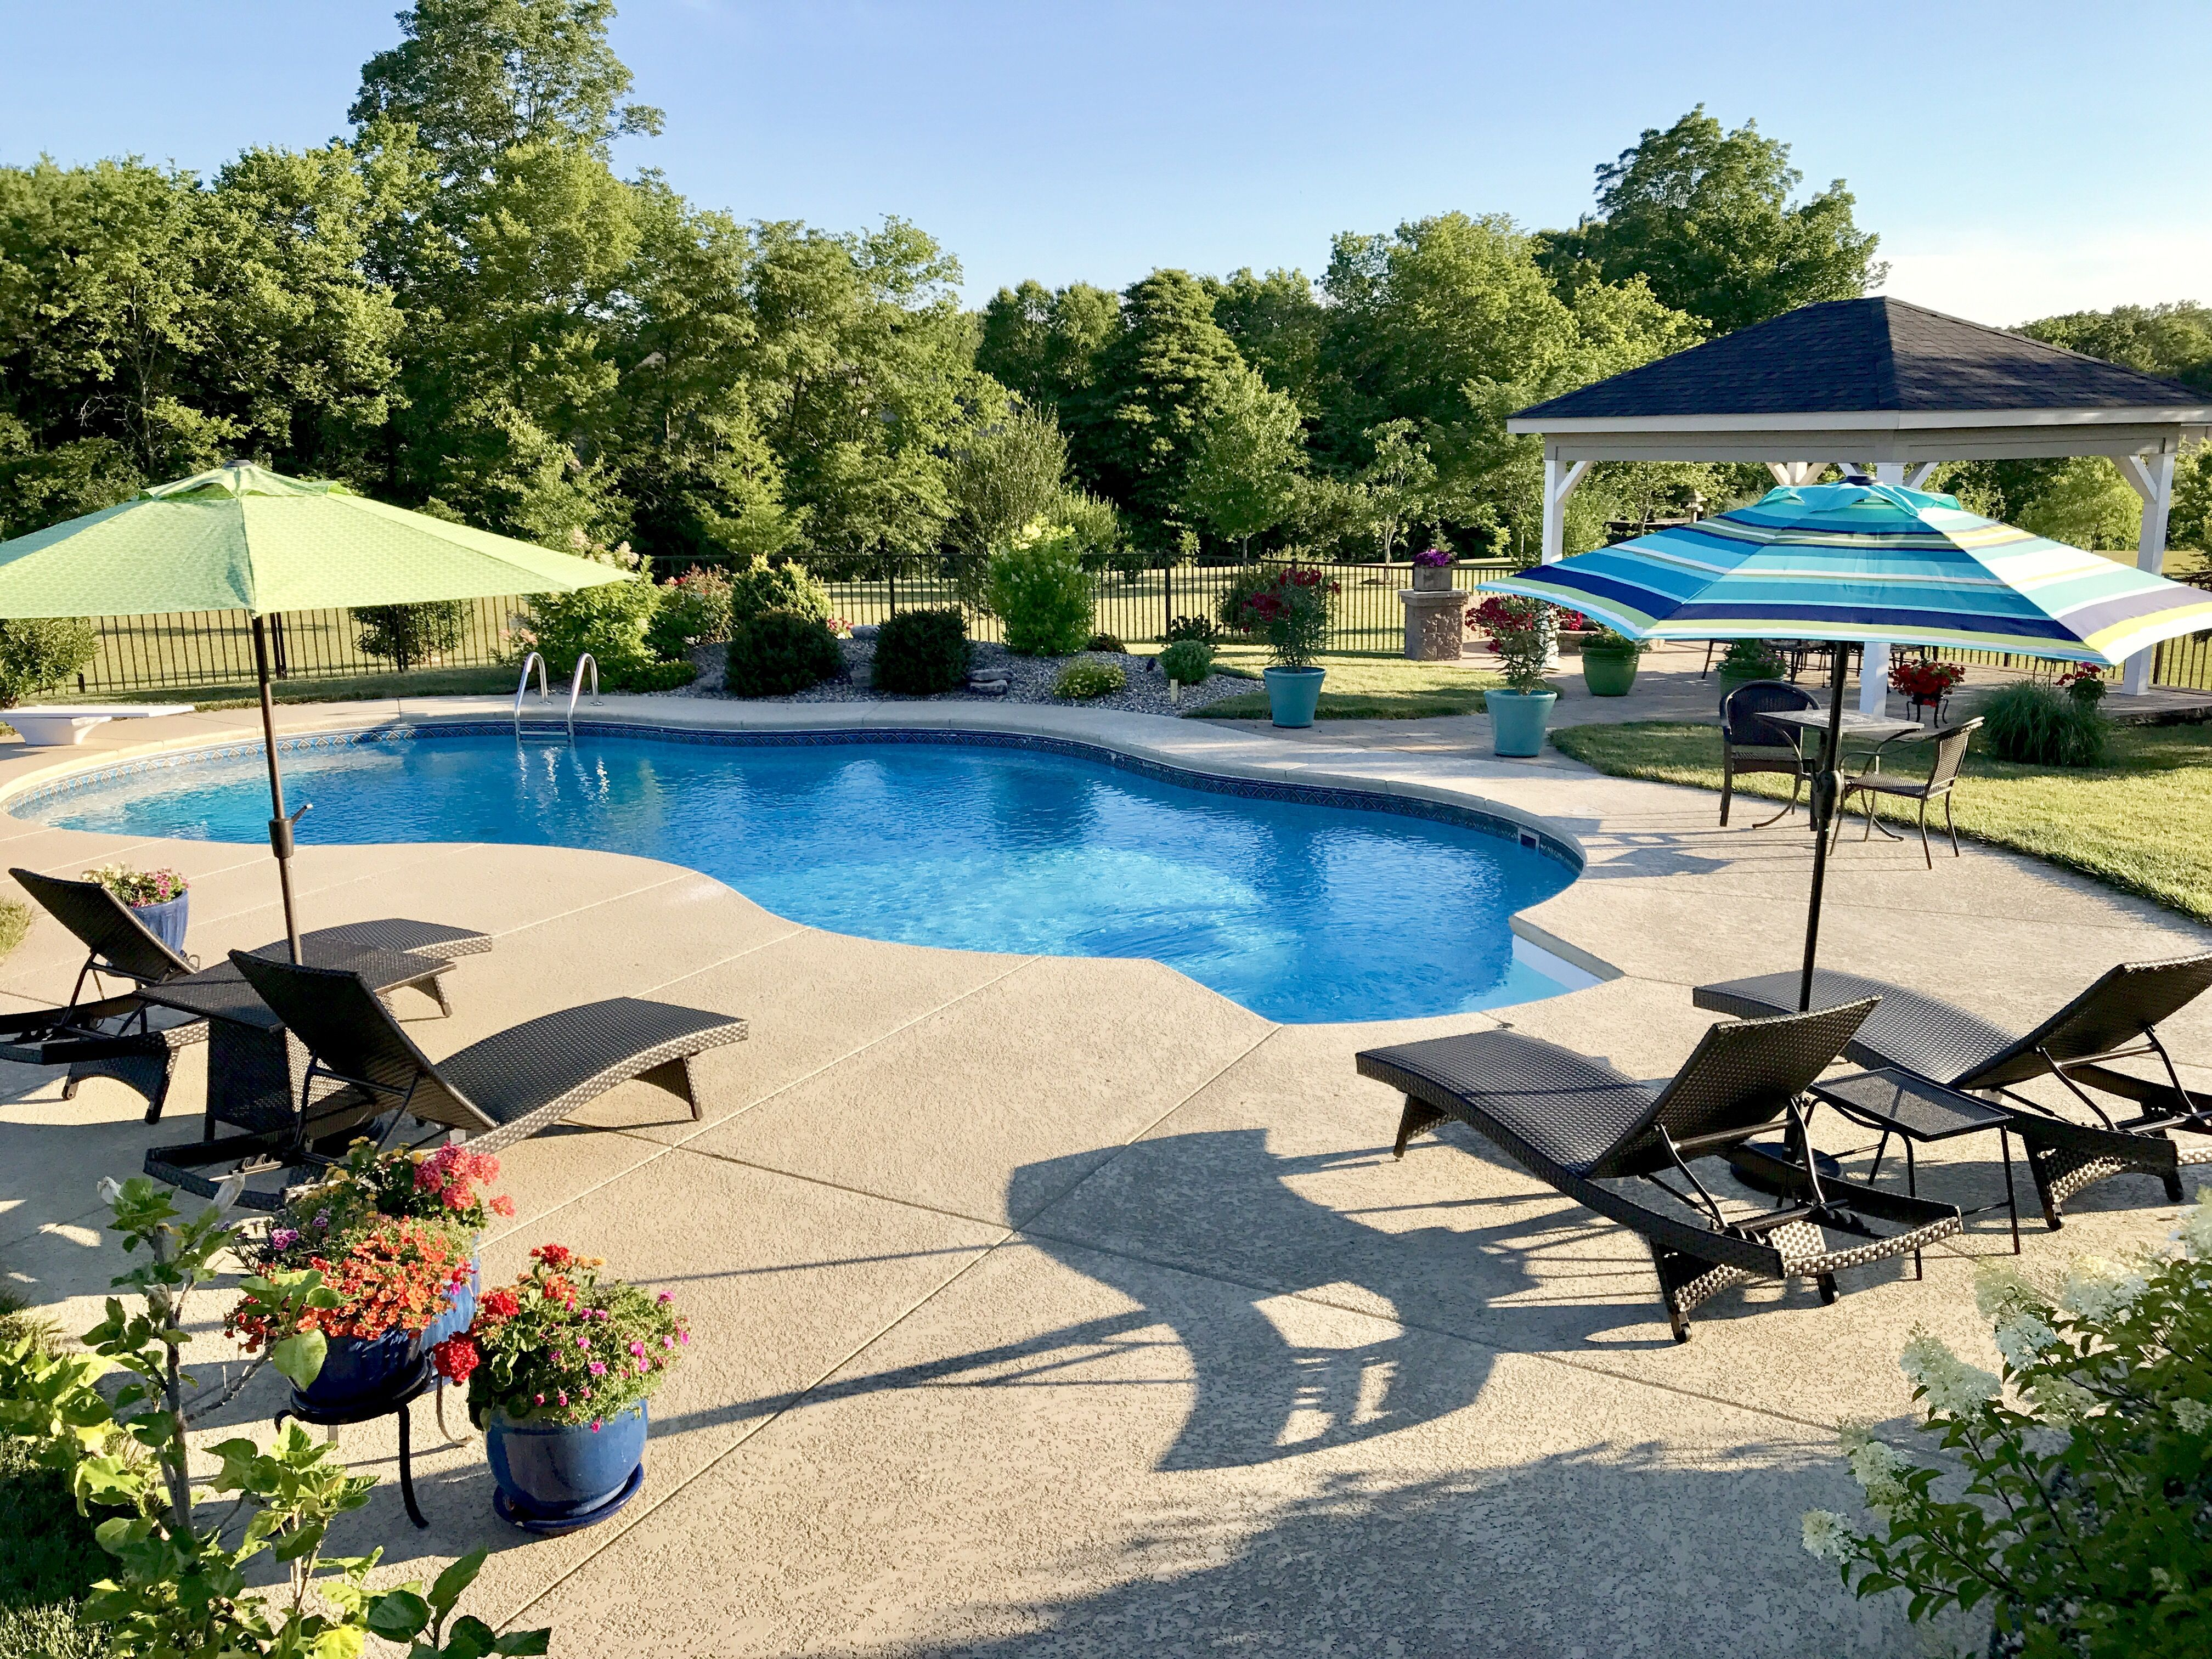 Backyard oasis, backyard pool, swimming pool, irregular shaped pools ...